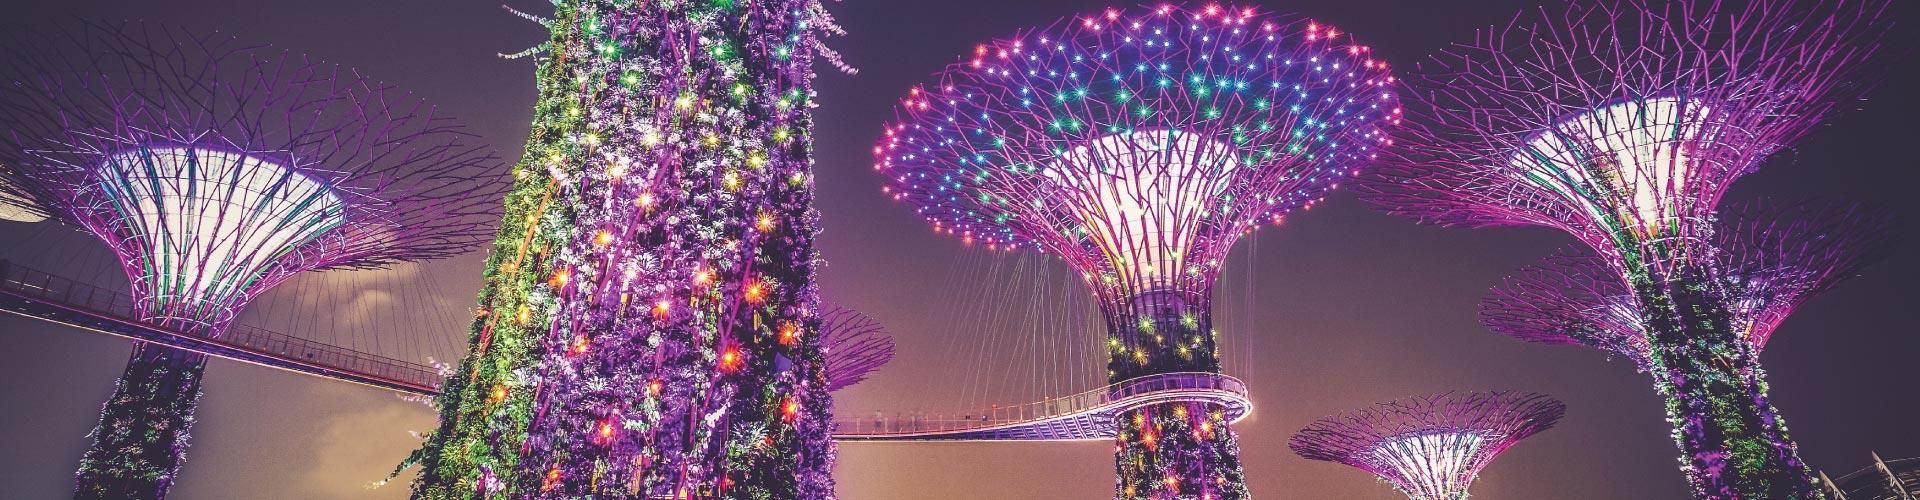 Thailand & Vietnam Cruise (Royal Caribbean)